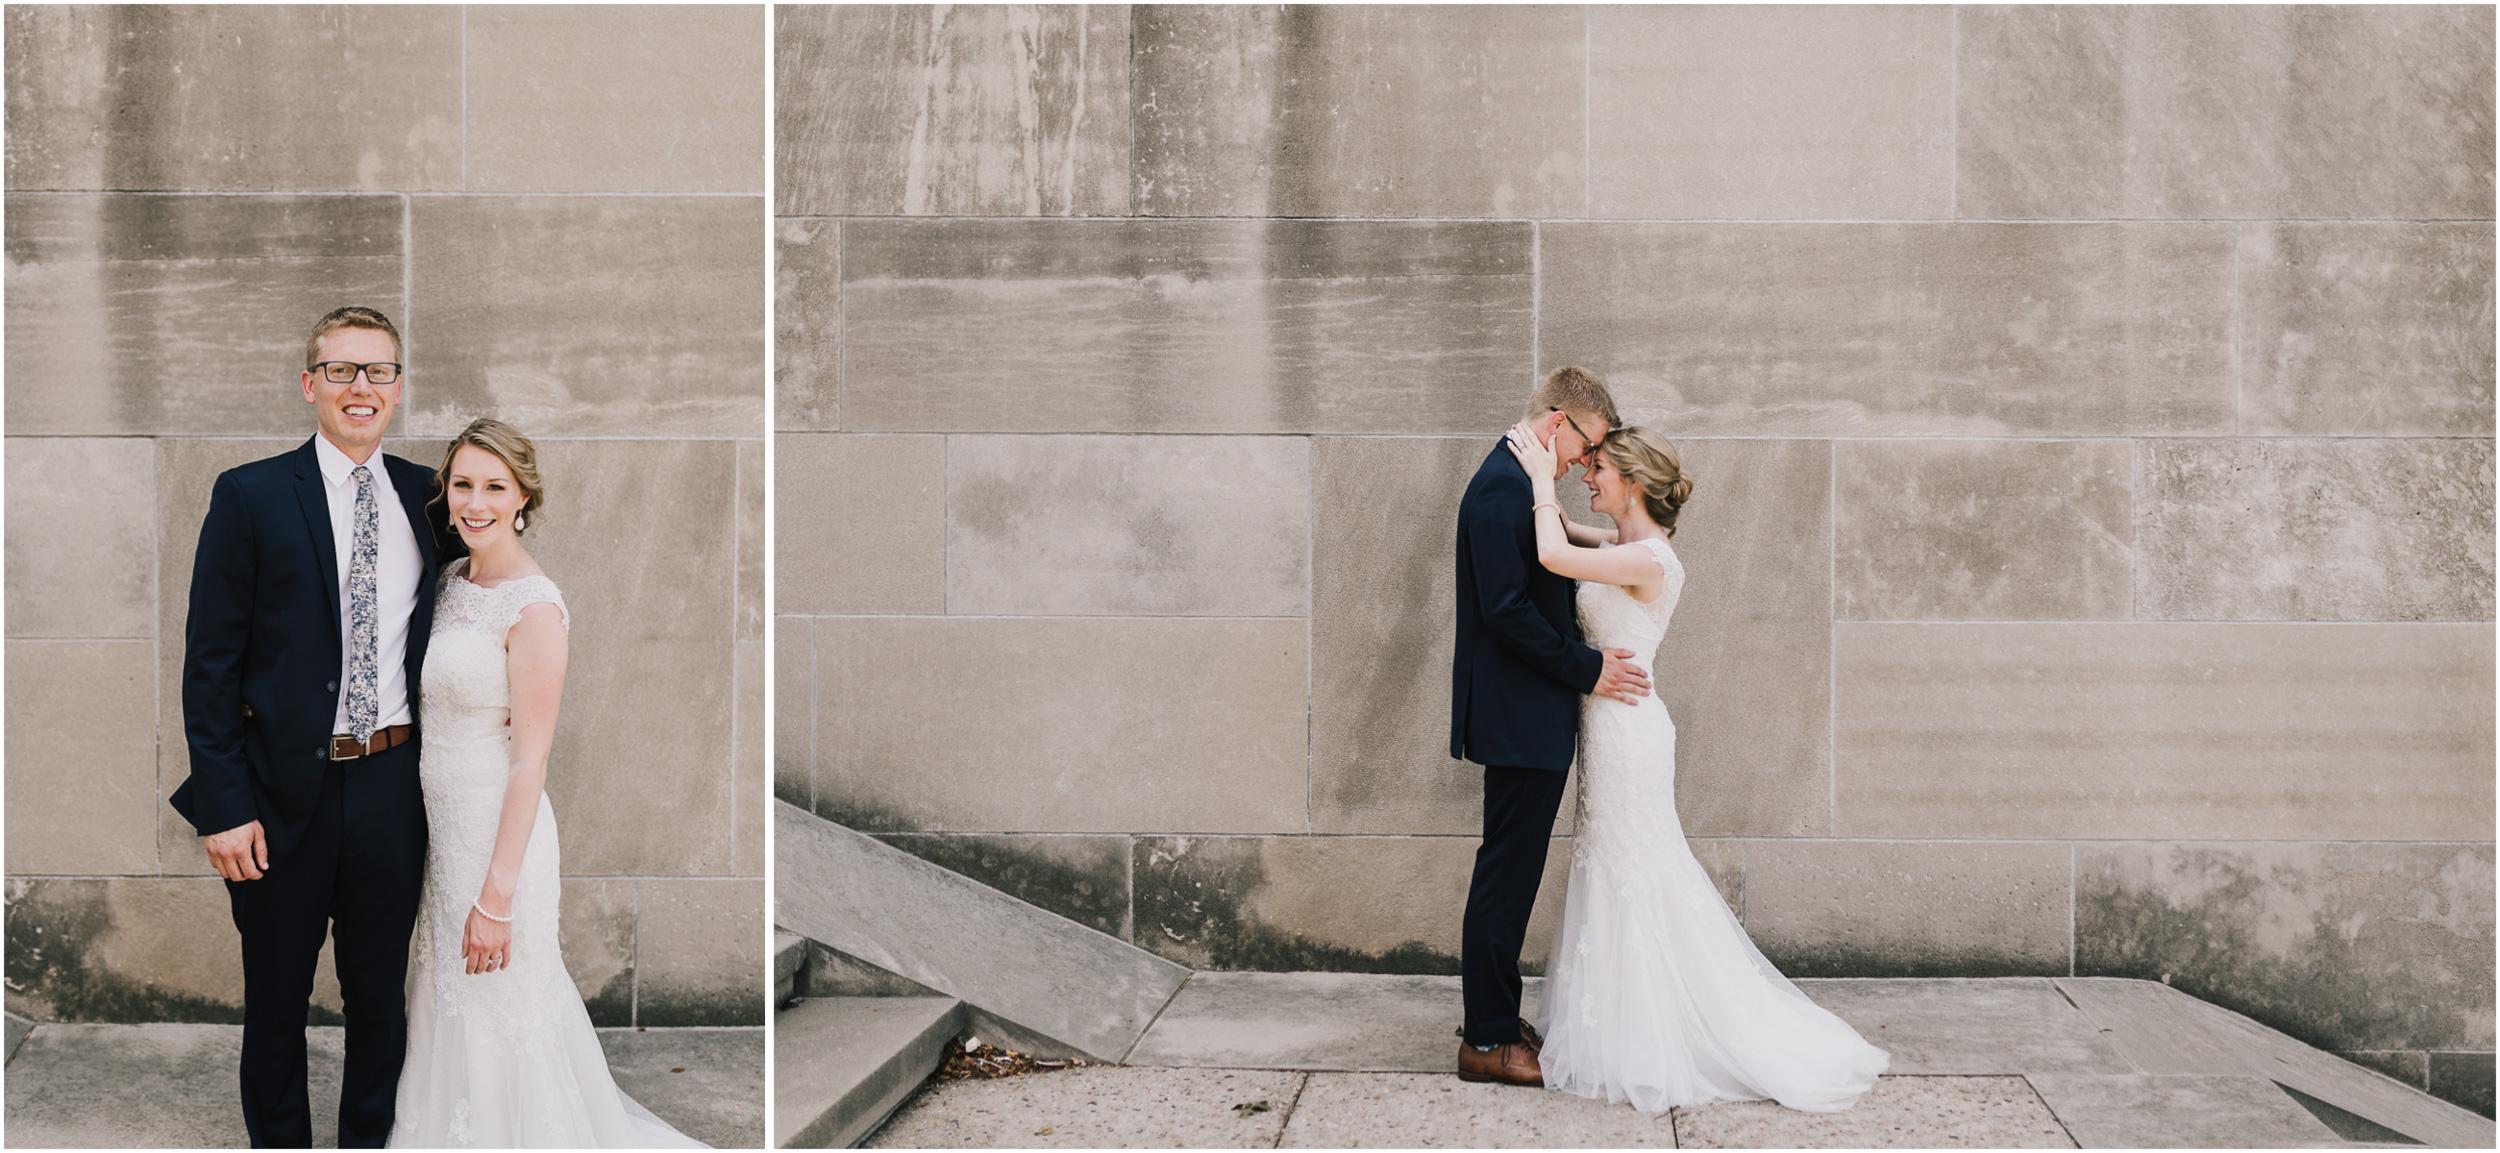 alyssa barletter photography classic kansas city summer wedding photographer dustin and erica king-23.jpg